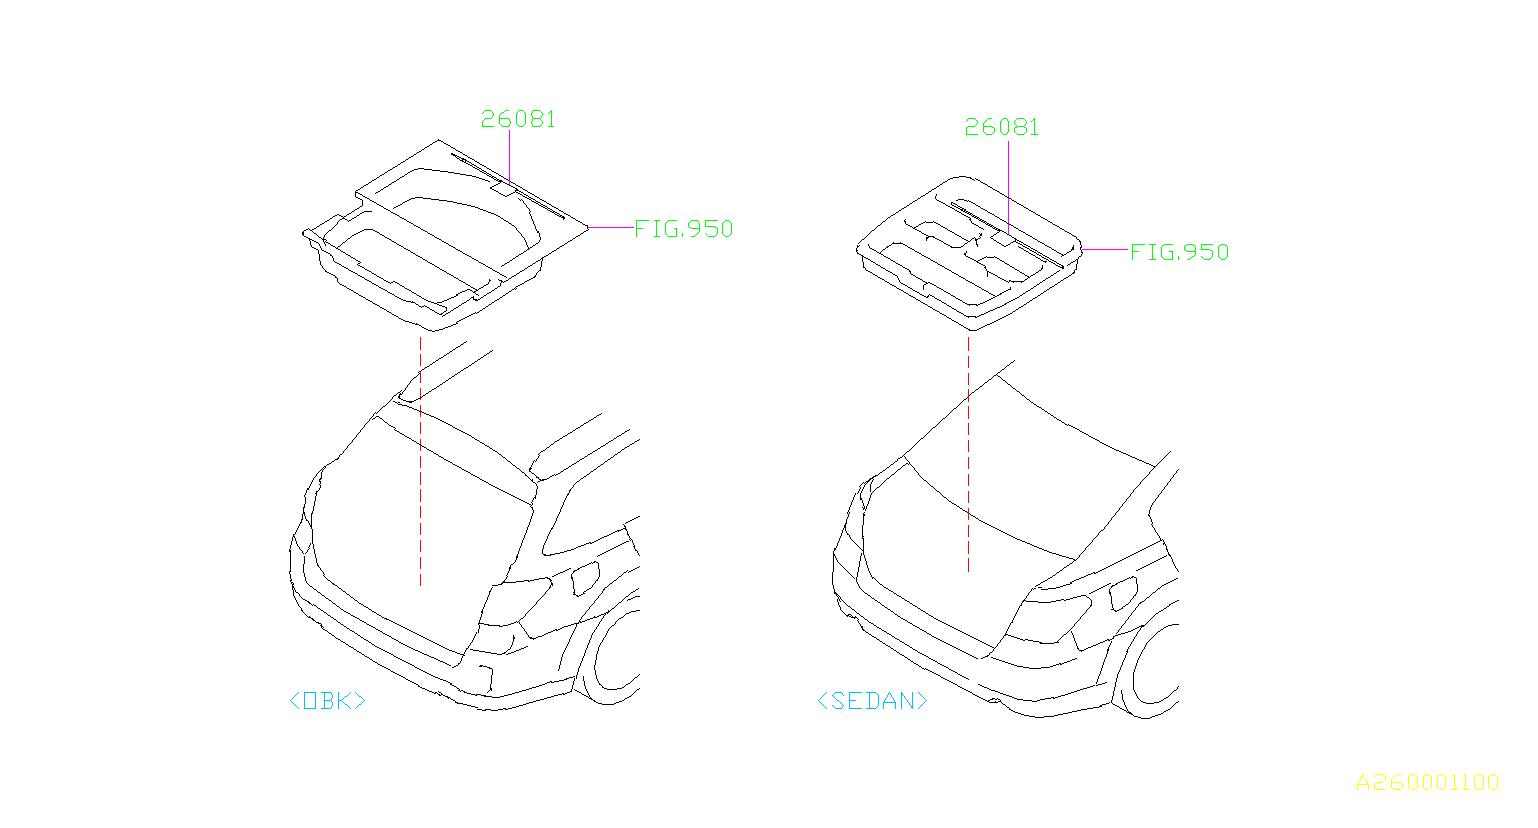 Subaru Outback Tool Electric Parking Brake System